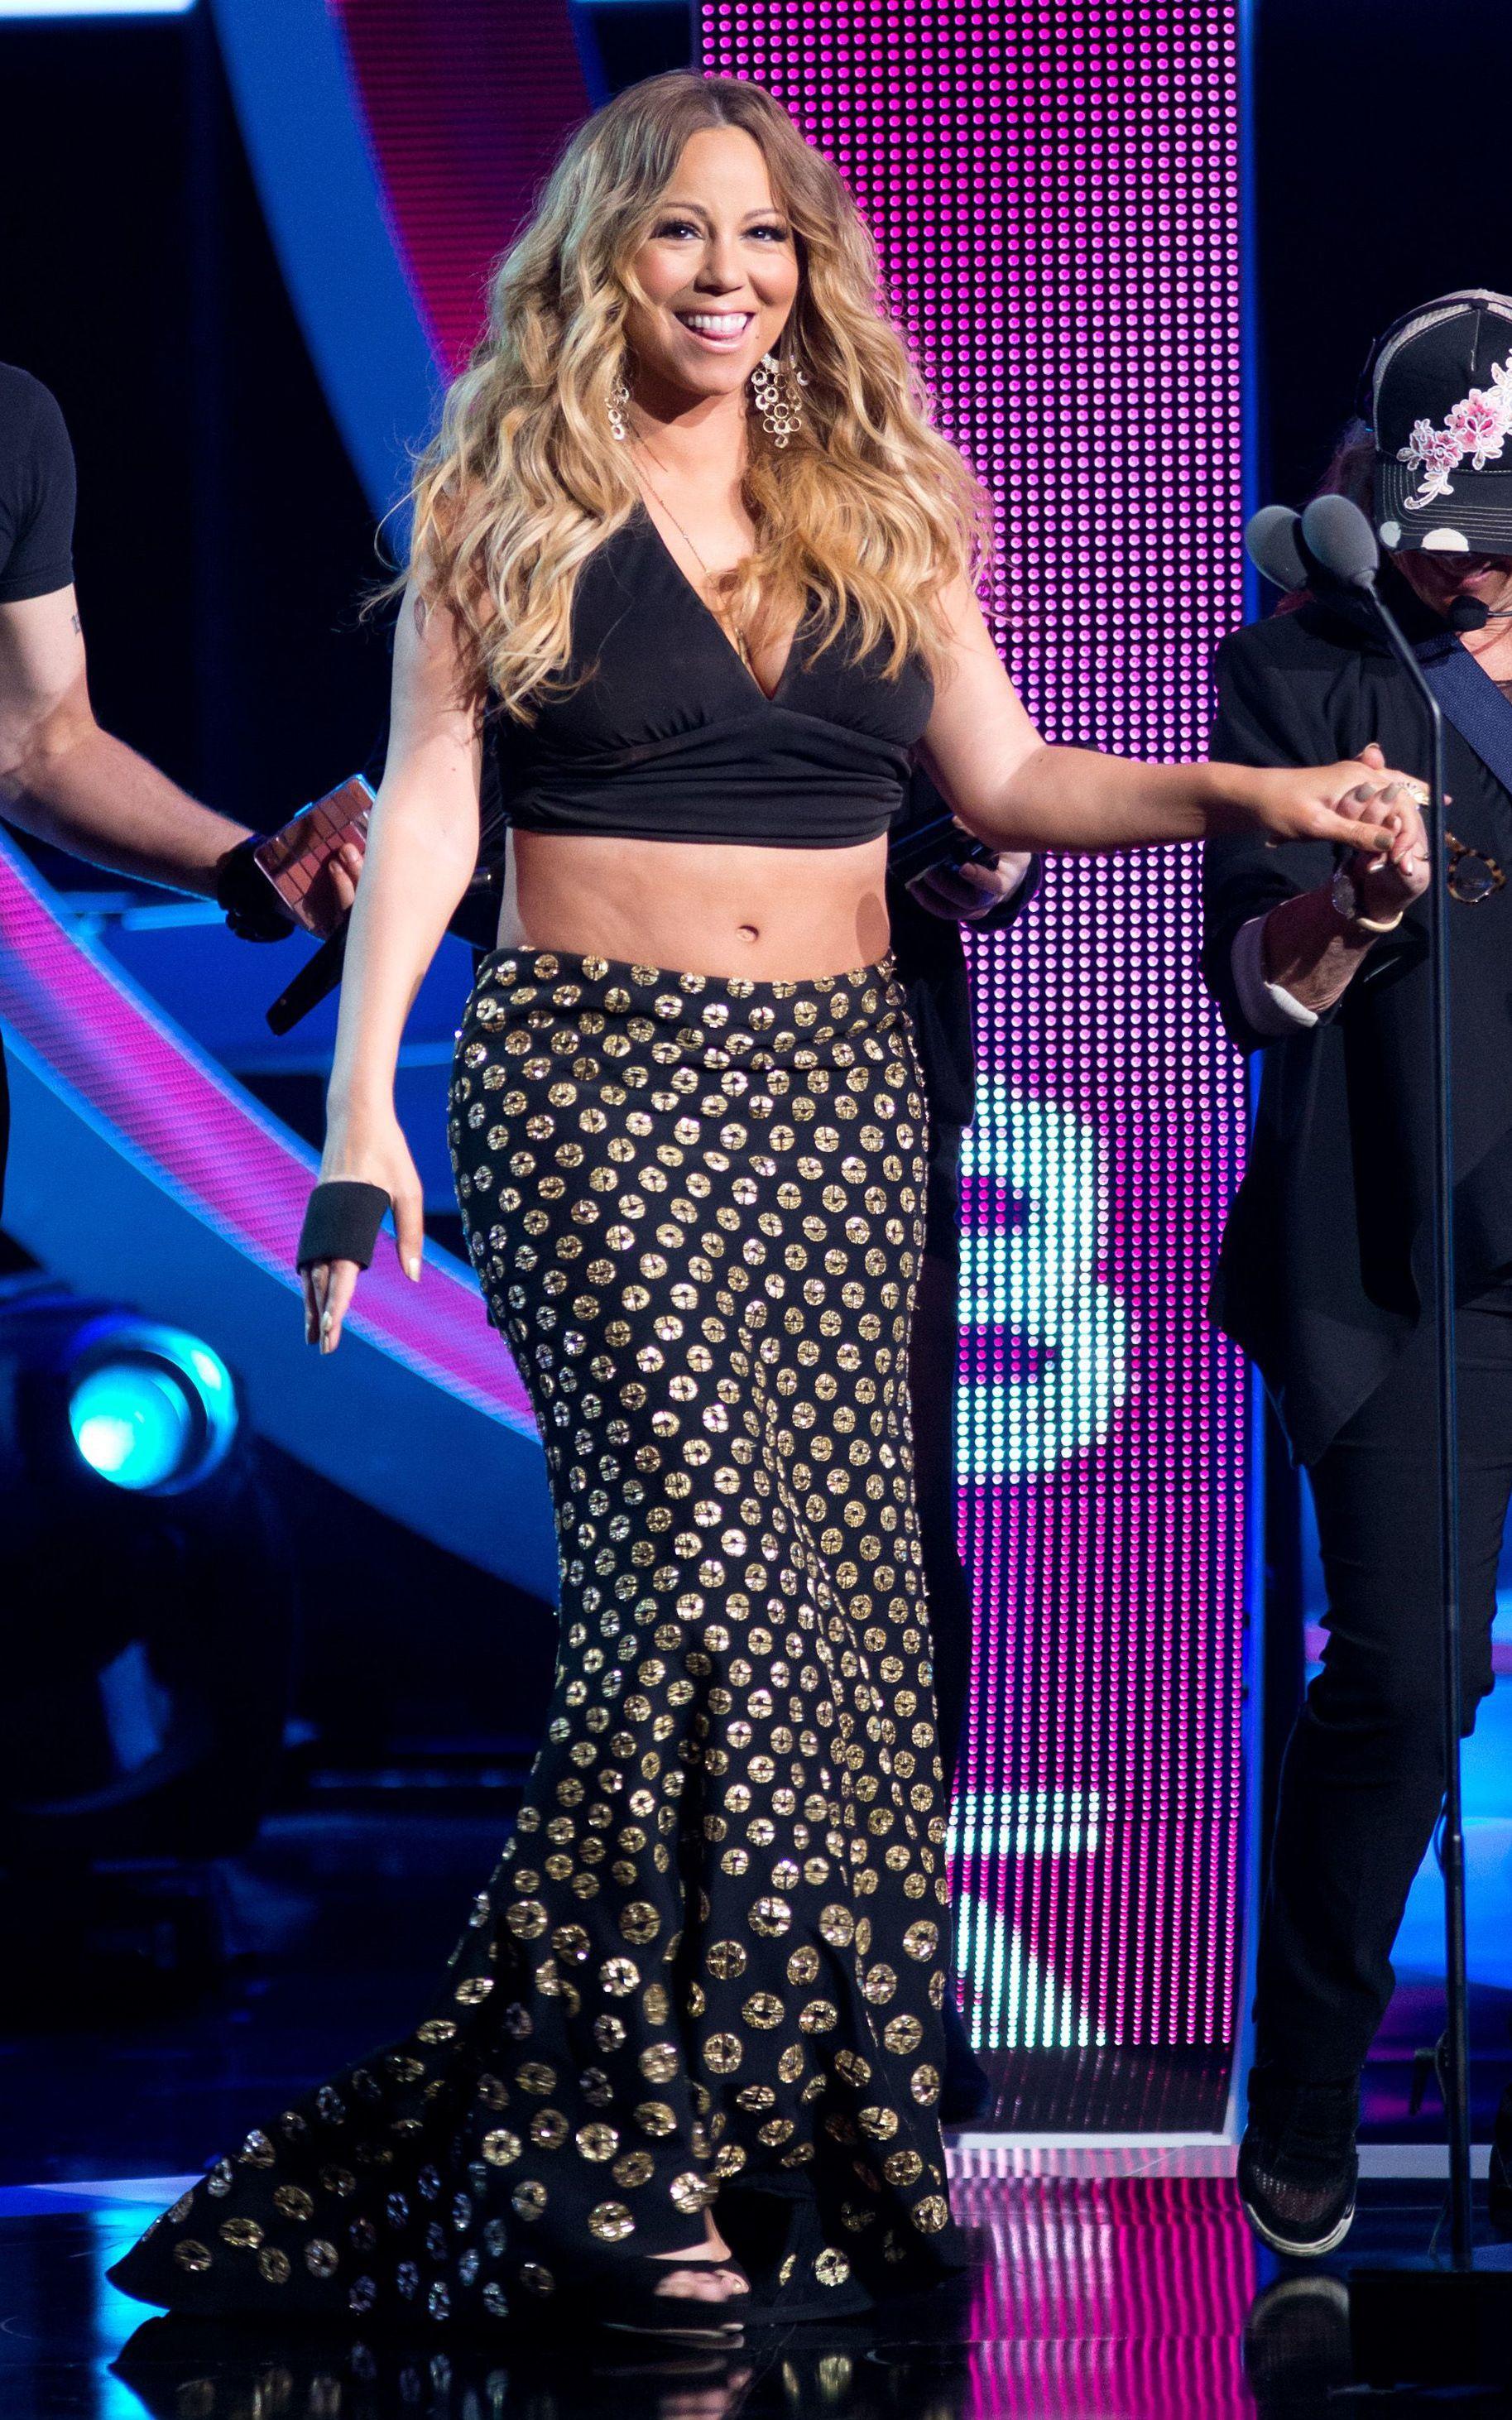 Mariah Carey midriff